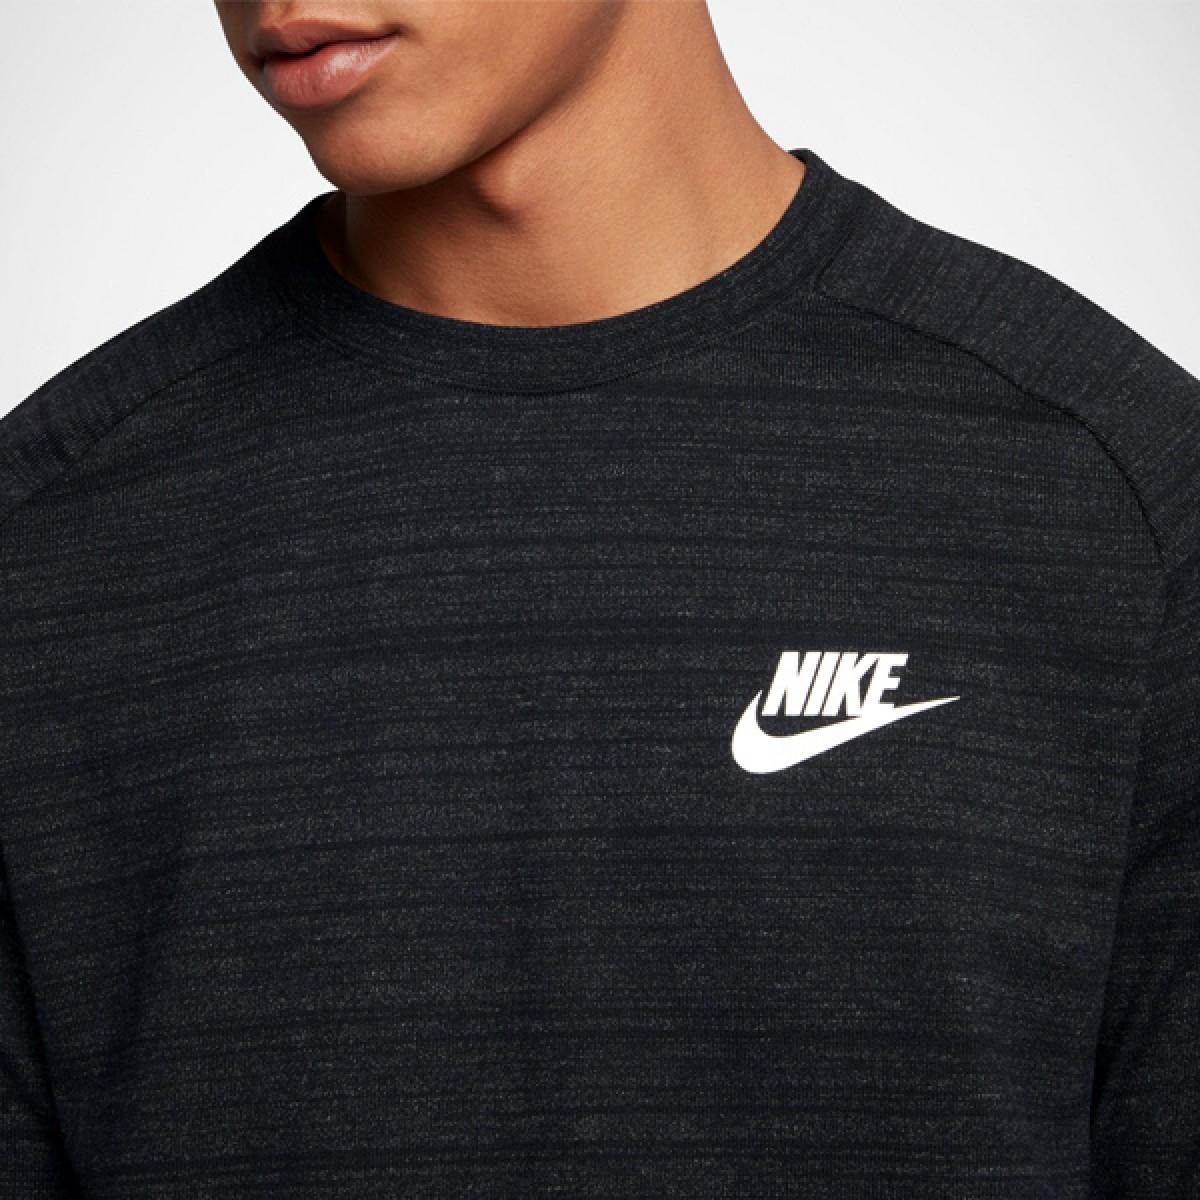 Nike Sportswear Advance 15 Crew 'Black' 861758-010